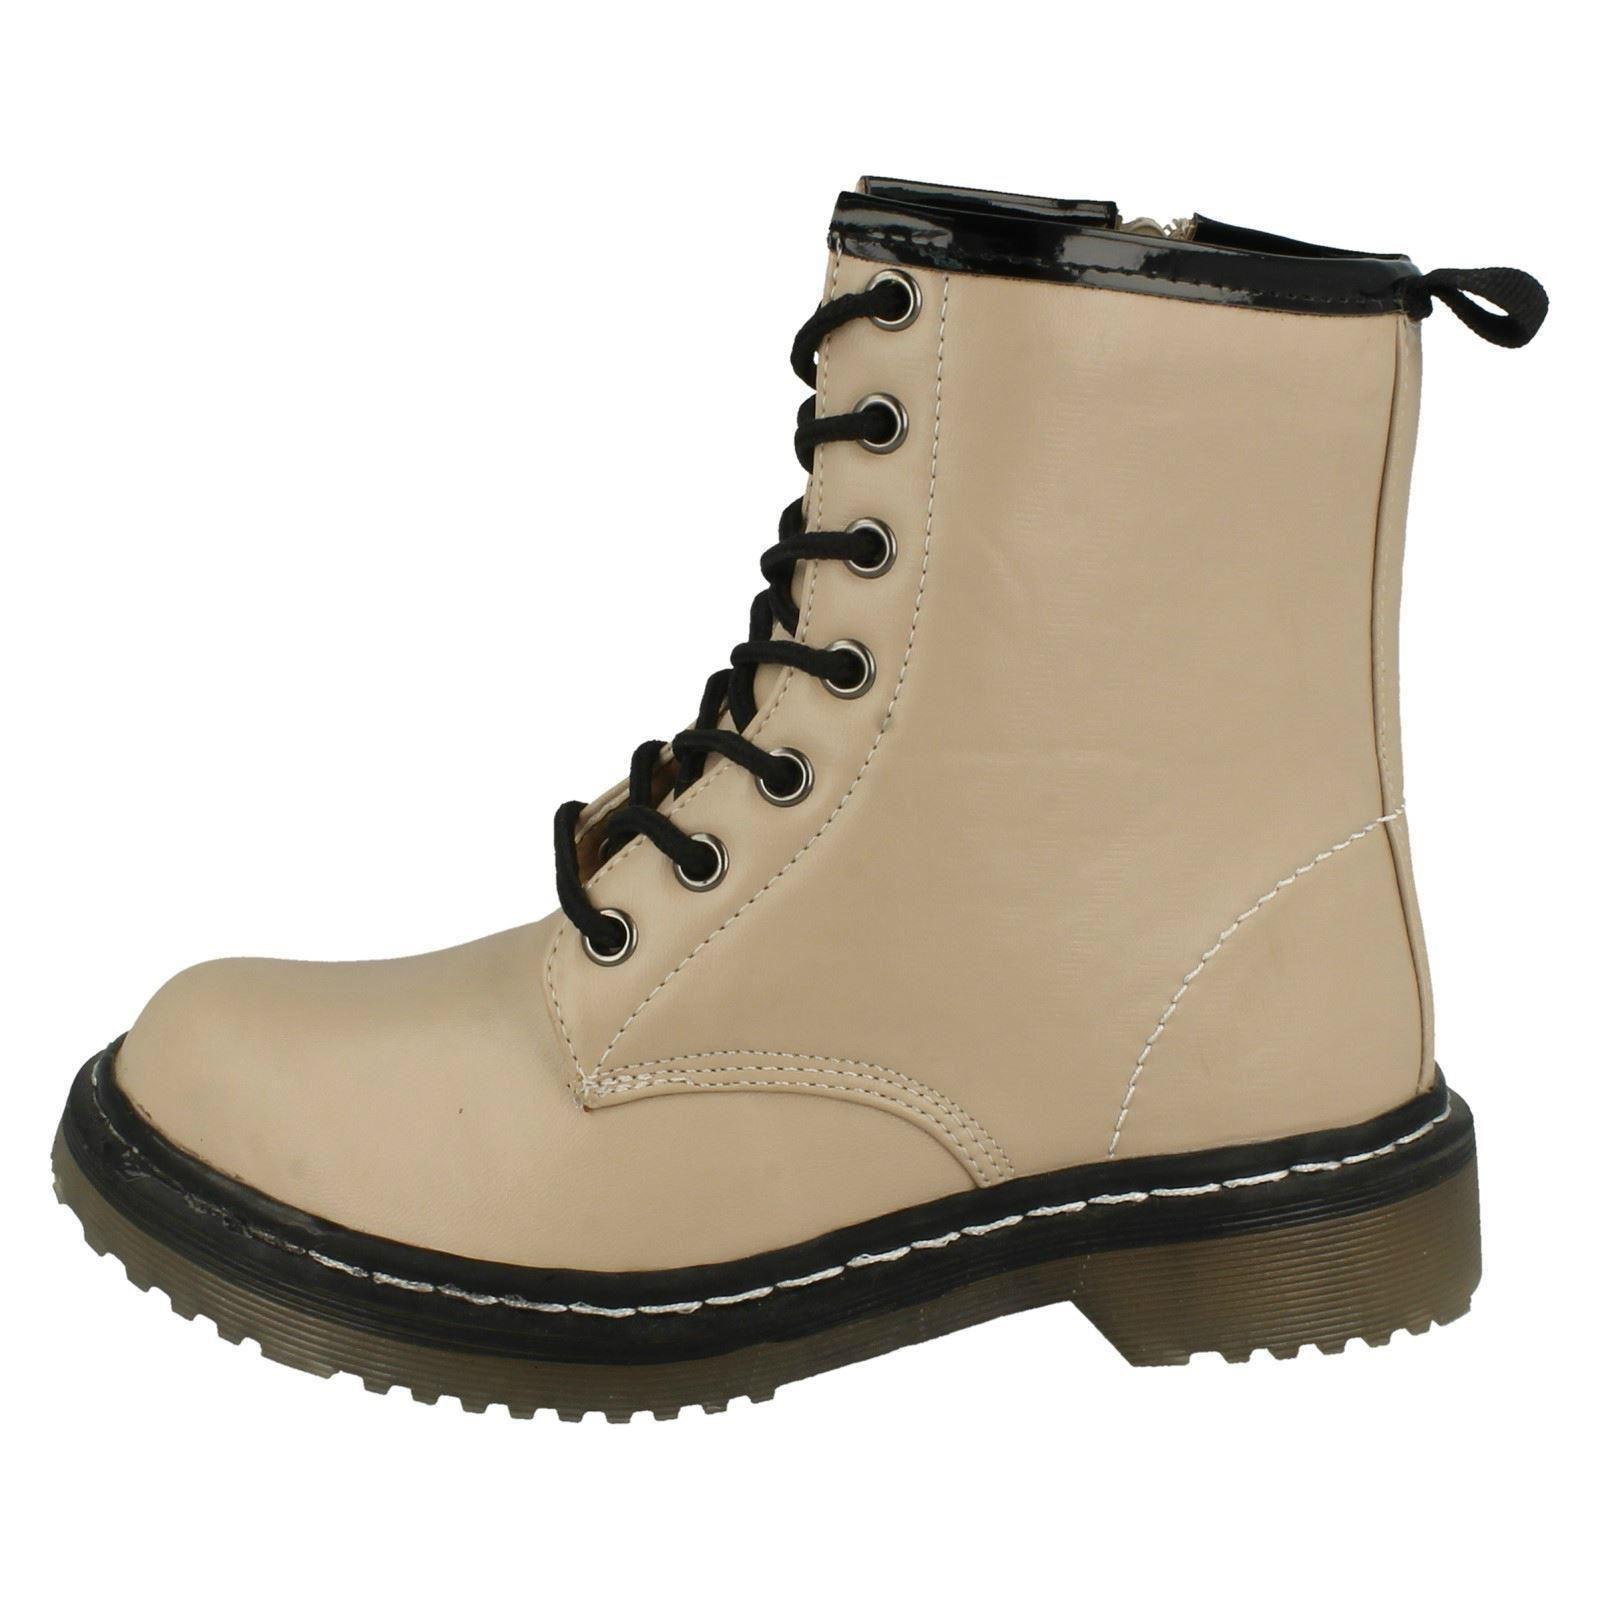 Girls Doc Martin Shoes